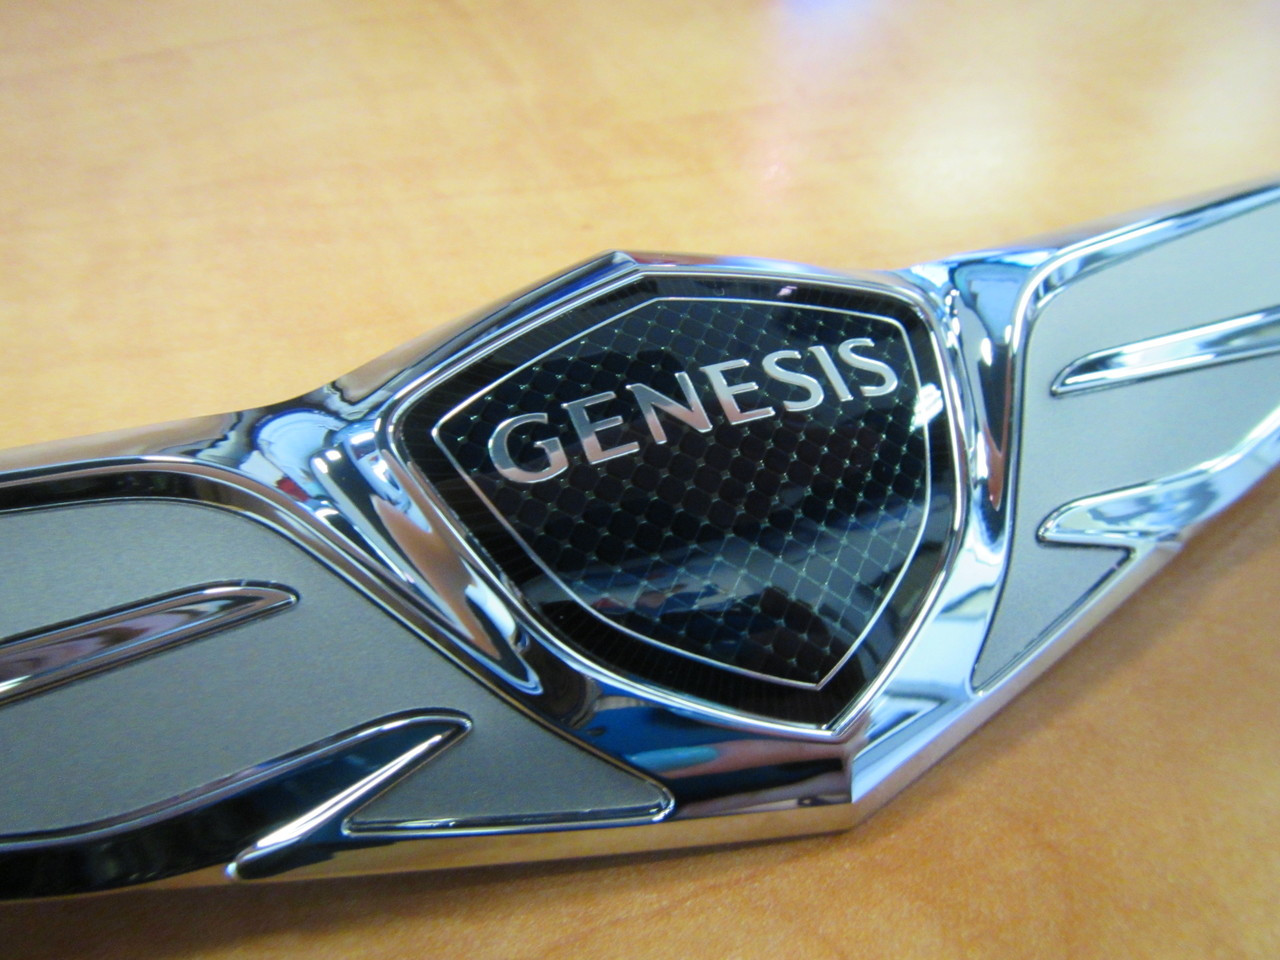 Genuine OEM Wing Logo Front Rear Emblem Fits: HYUNDAI Genesis 2017+ G80 Sedan